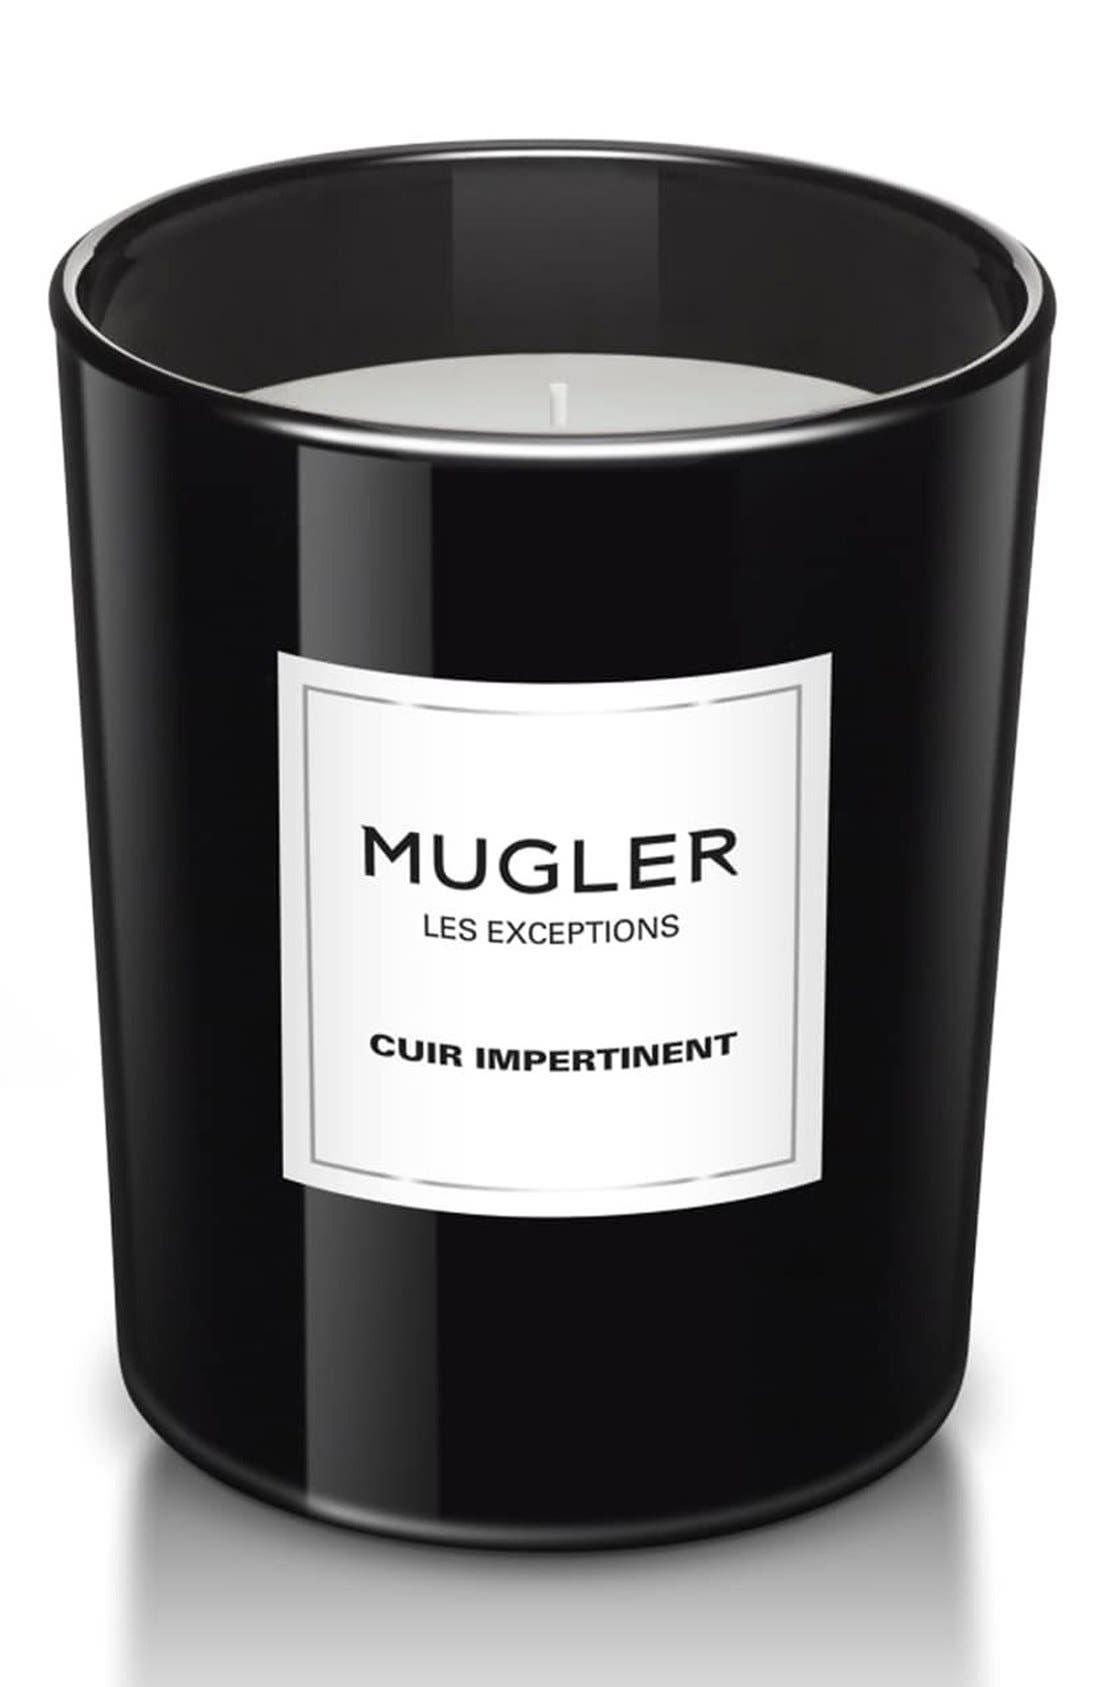 Mugler 'Les Exceptions - Cuir Impertinent' Candle,                             Main thumbnail 1, color,                             No Color